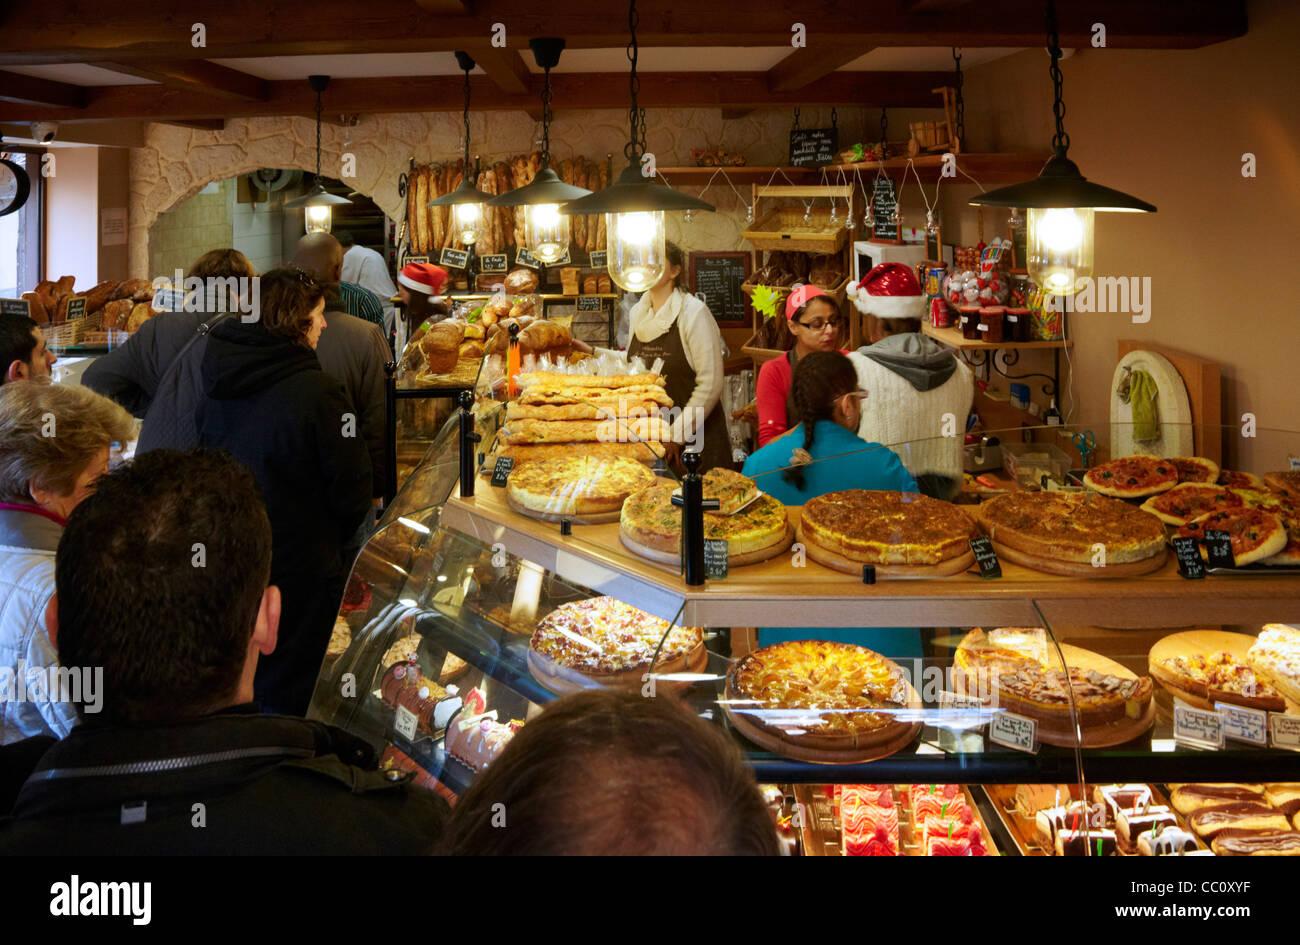 Christmas Eve queue in Boulangerie Alexandra, a popular bakery in suburbs of Paris. Le Perreux-sur-Marne, Val-de - Stock Image